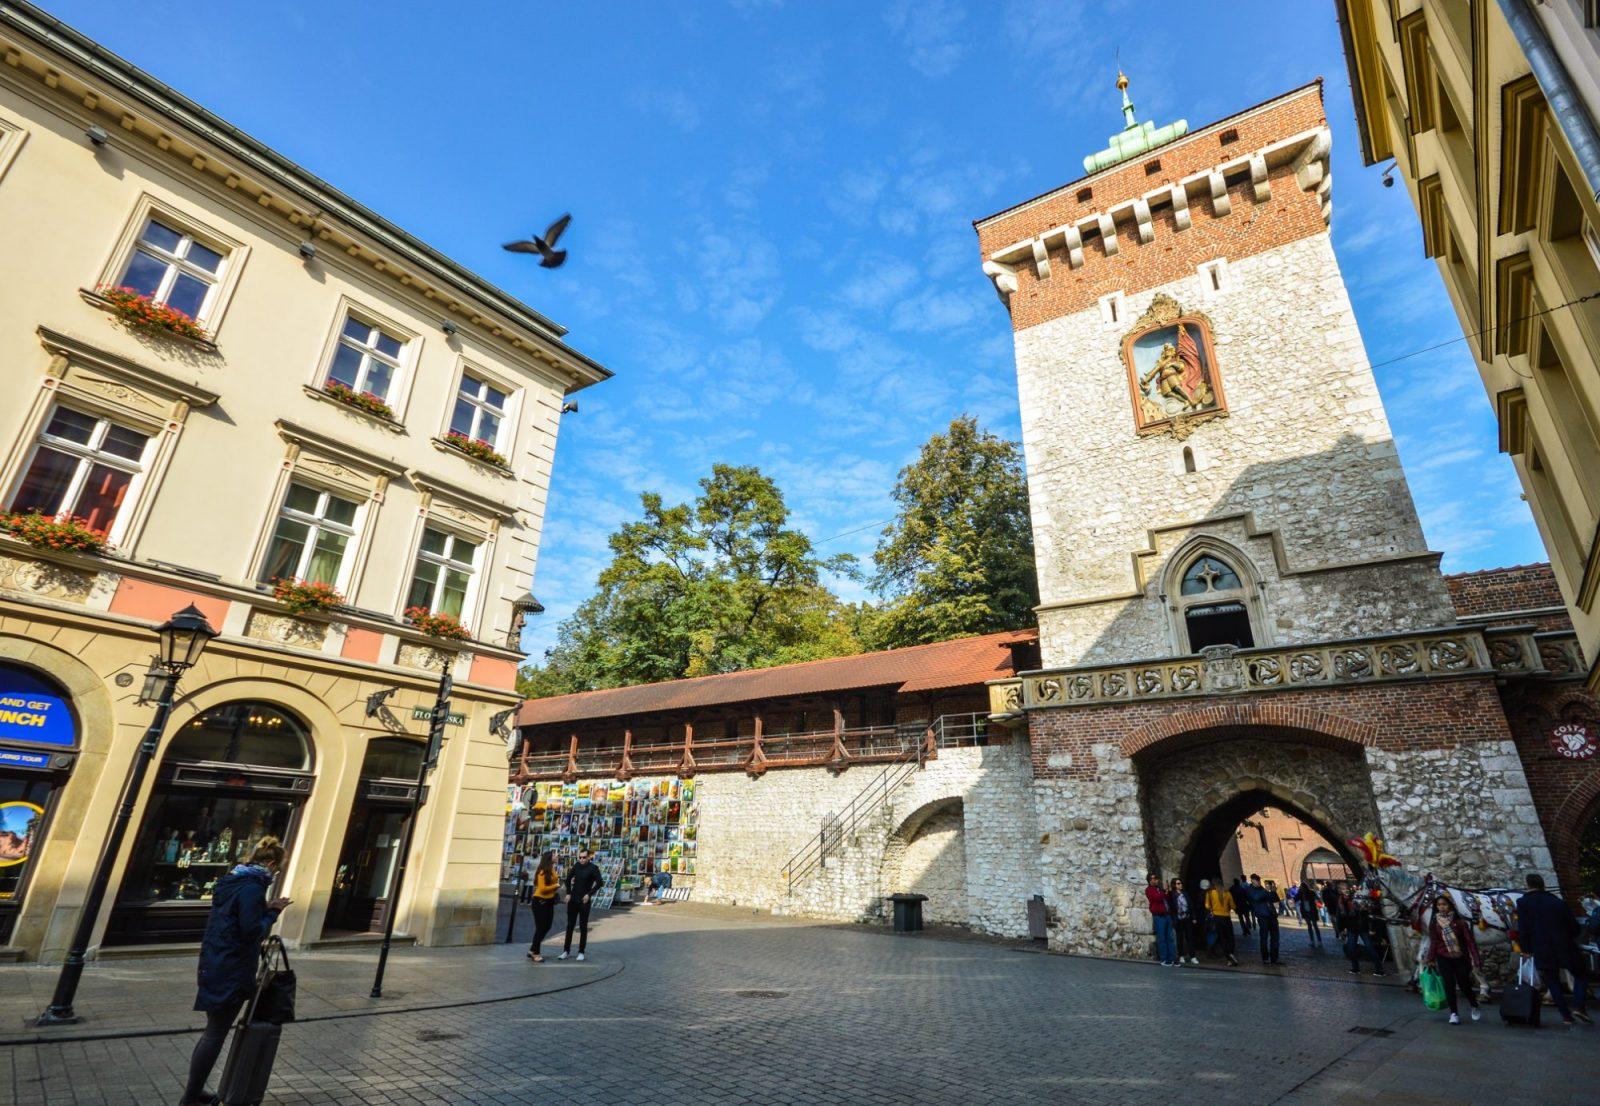 St. Florian Gate in Krakow Poland